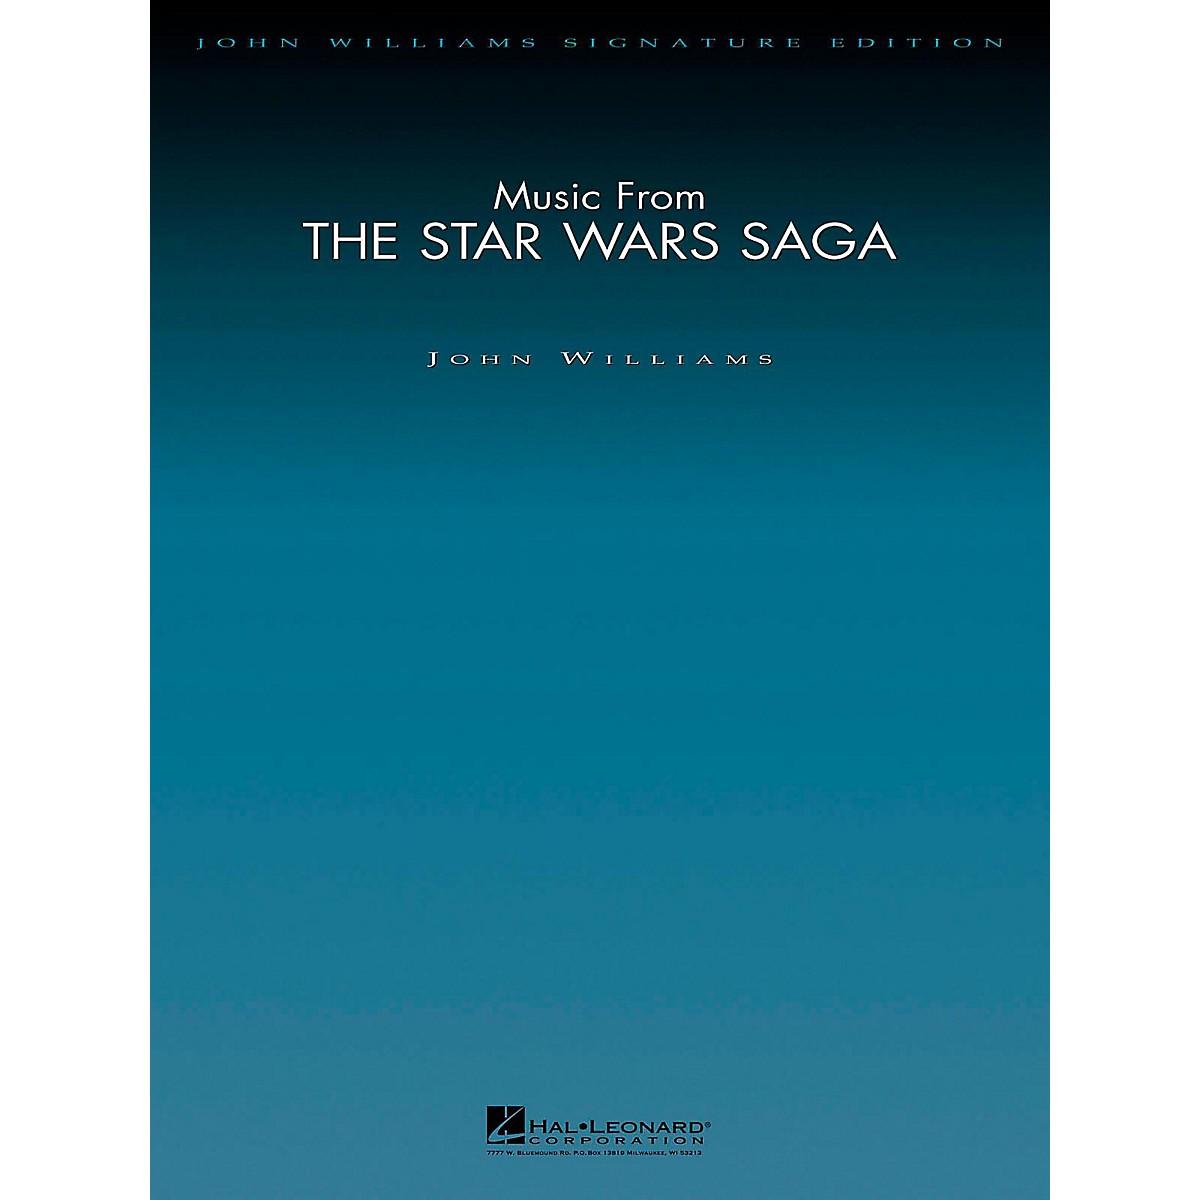 Hal Leonard Music From The Star Wars Saga - John Williams Signature Edition Orchestra Score and Parts